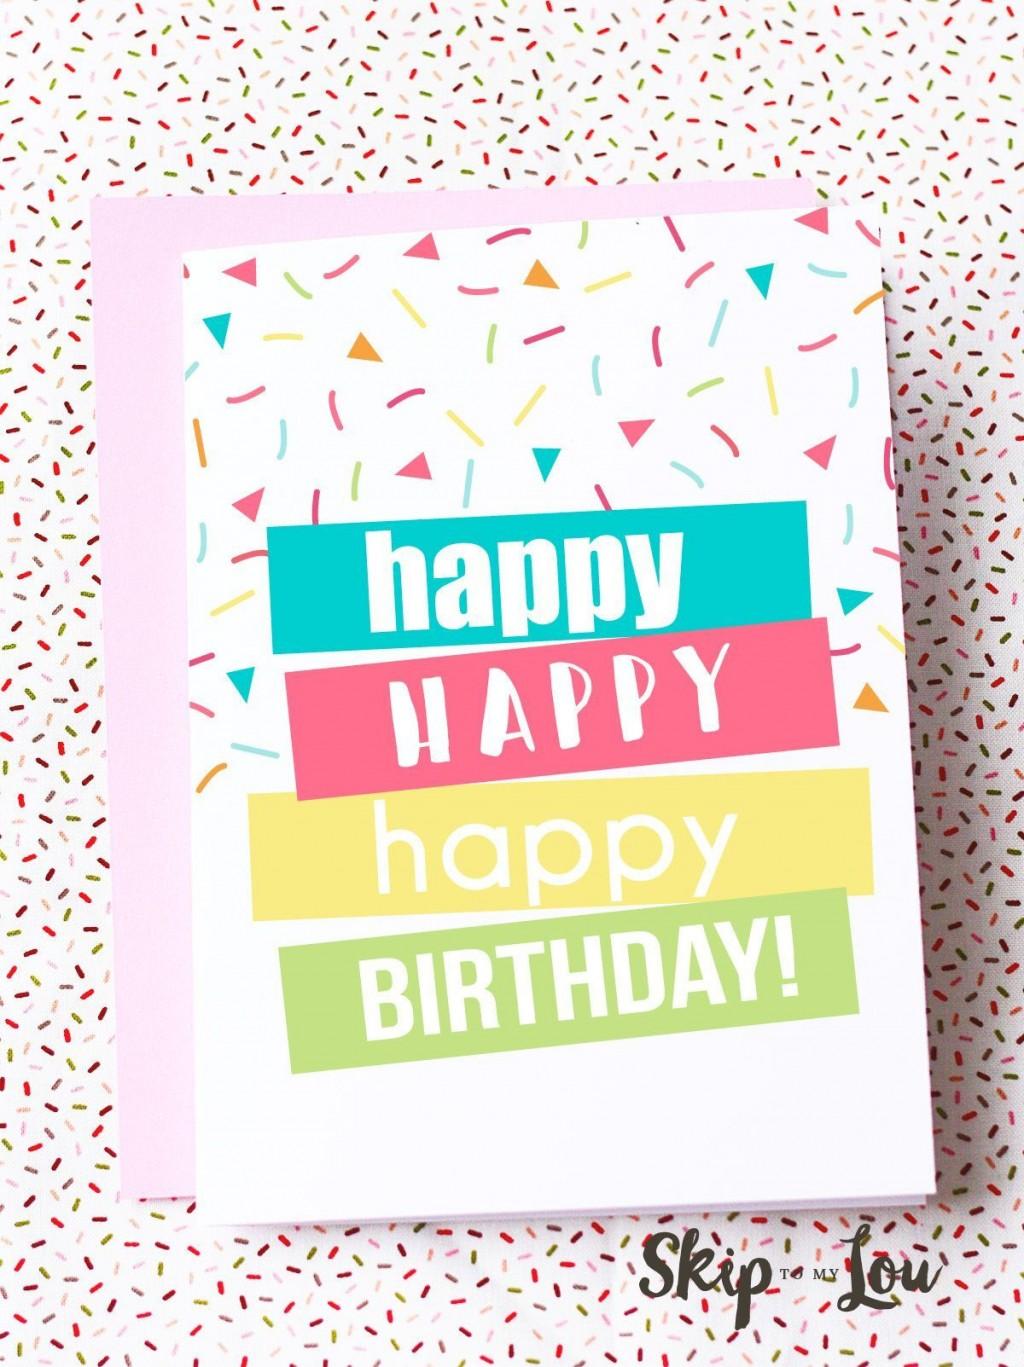 007 Wondrou Free Printable Birthday Card Template For Mac Design Large